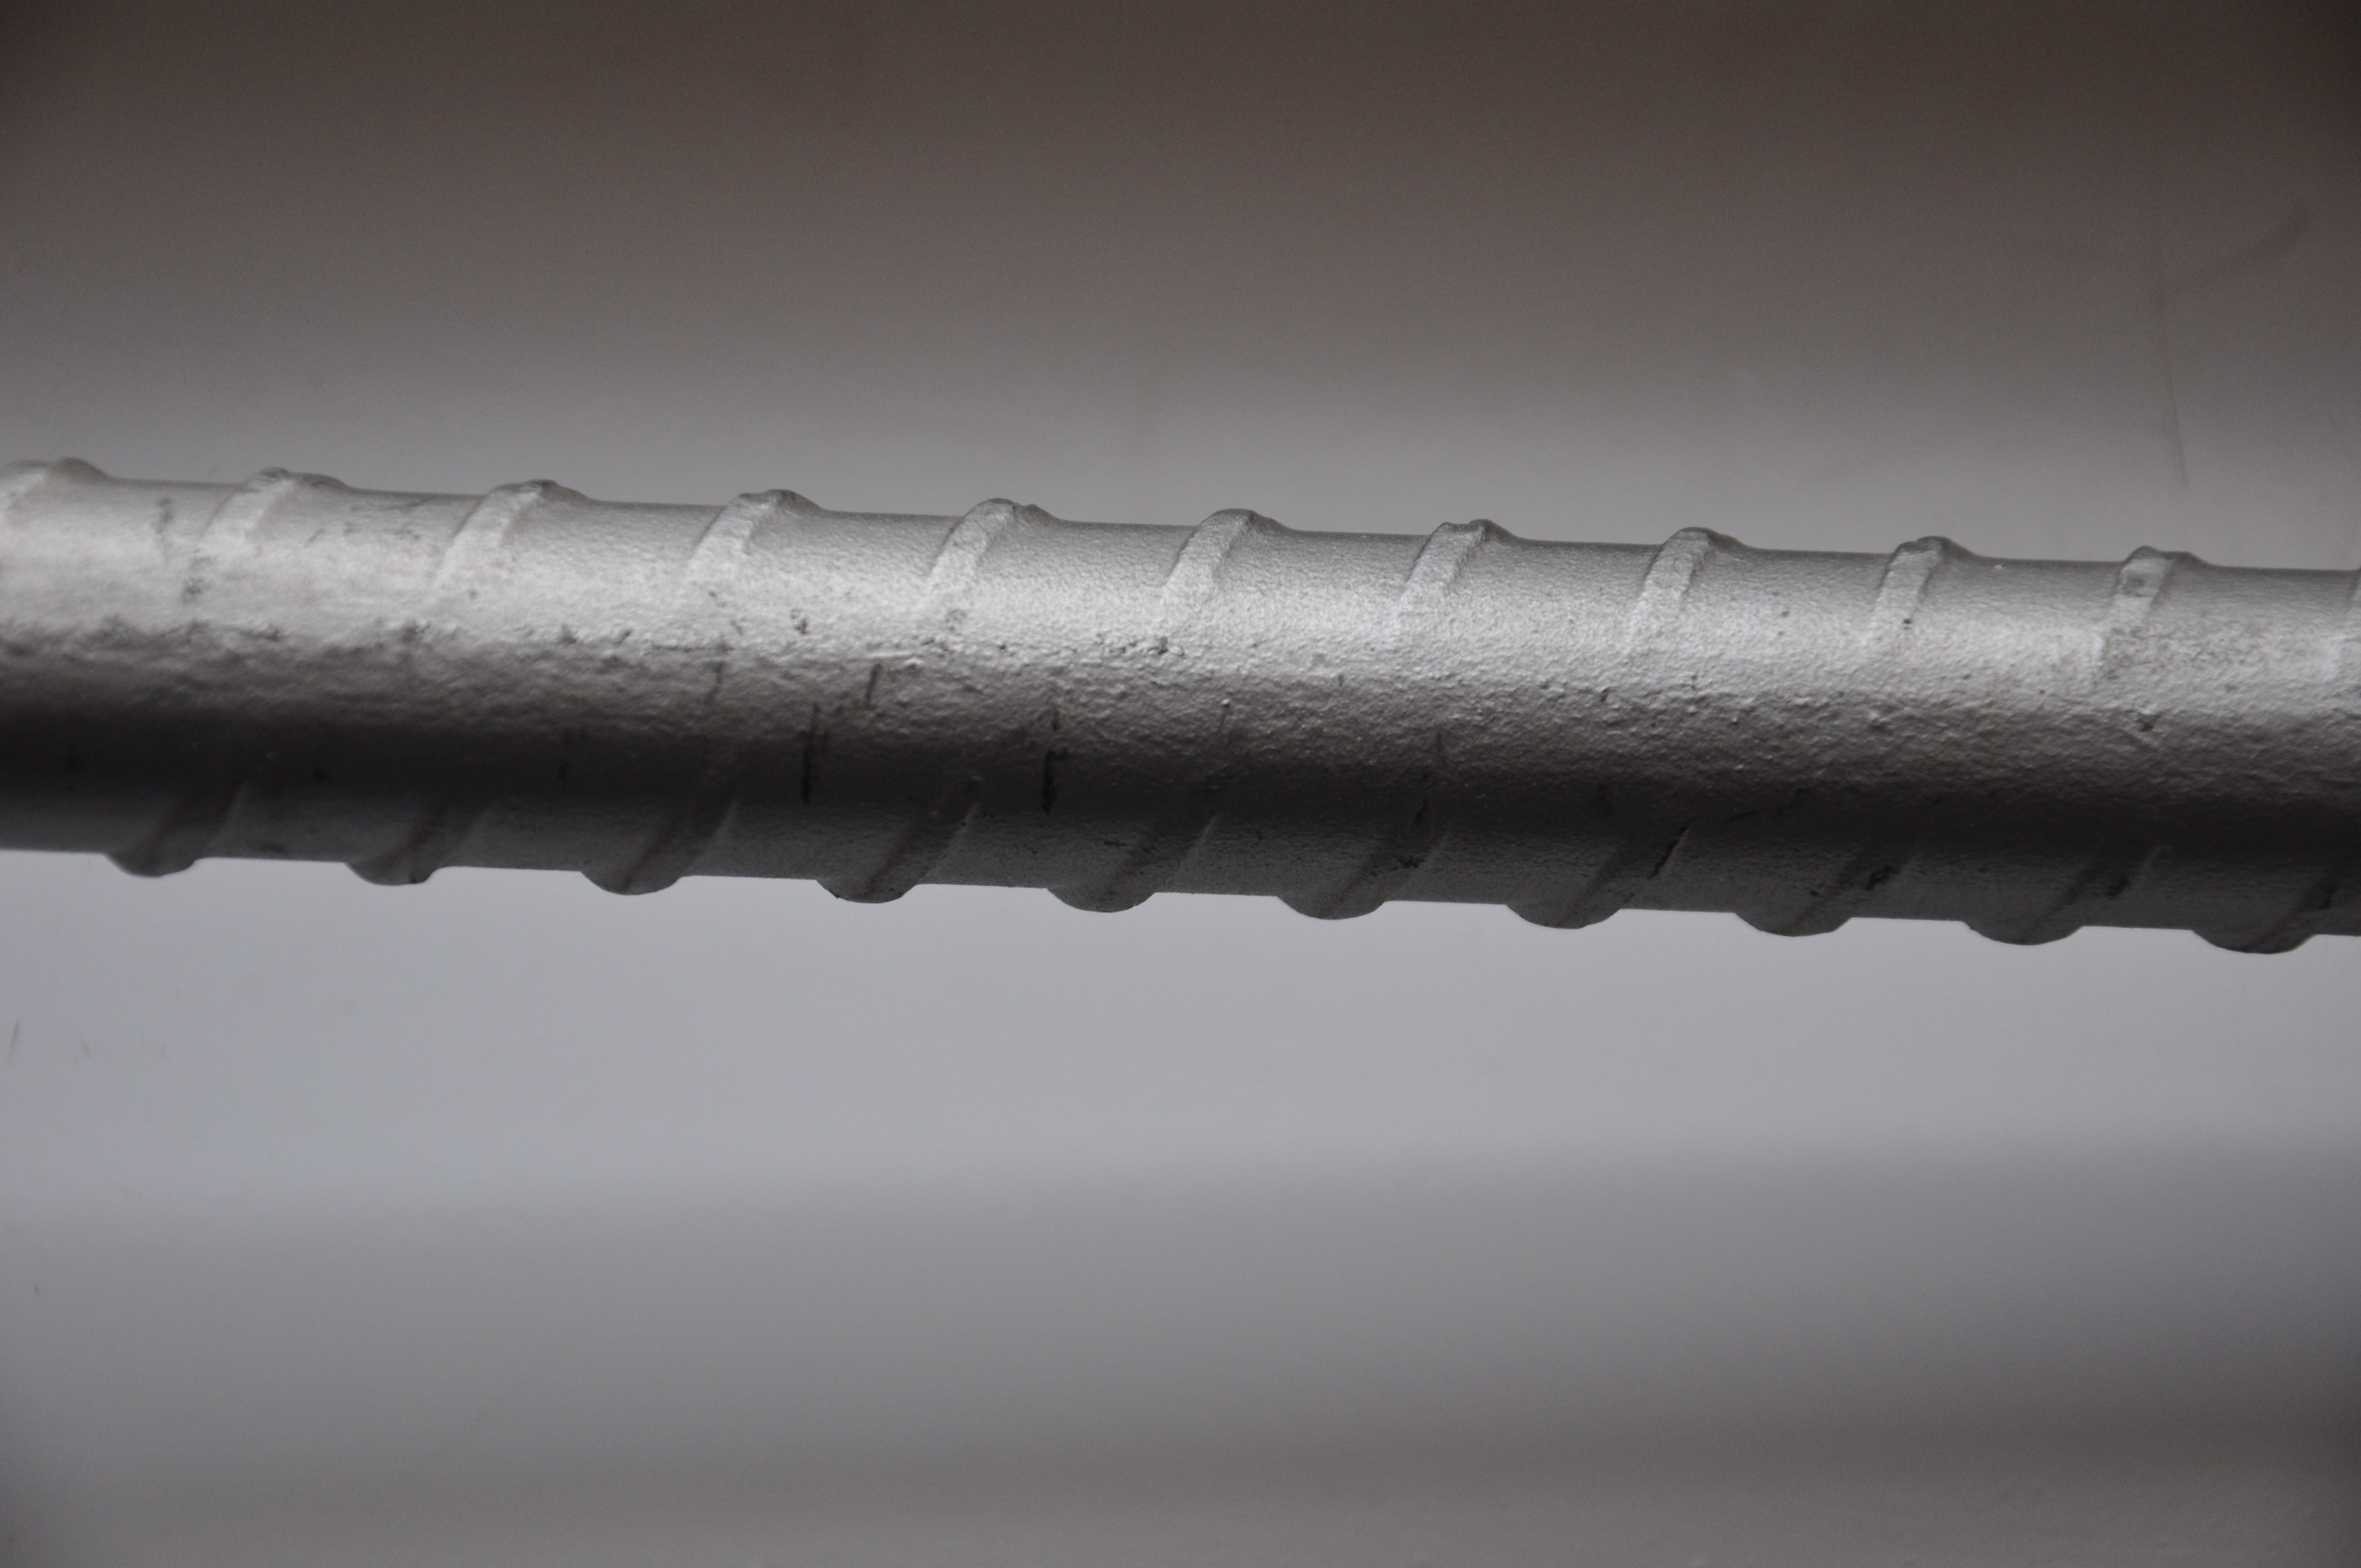 PSB400 PSB500 PSB785 PSB830 PSB930 PSB1080 Steel Rebars